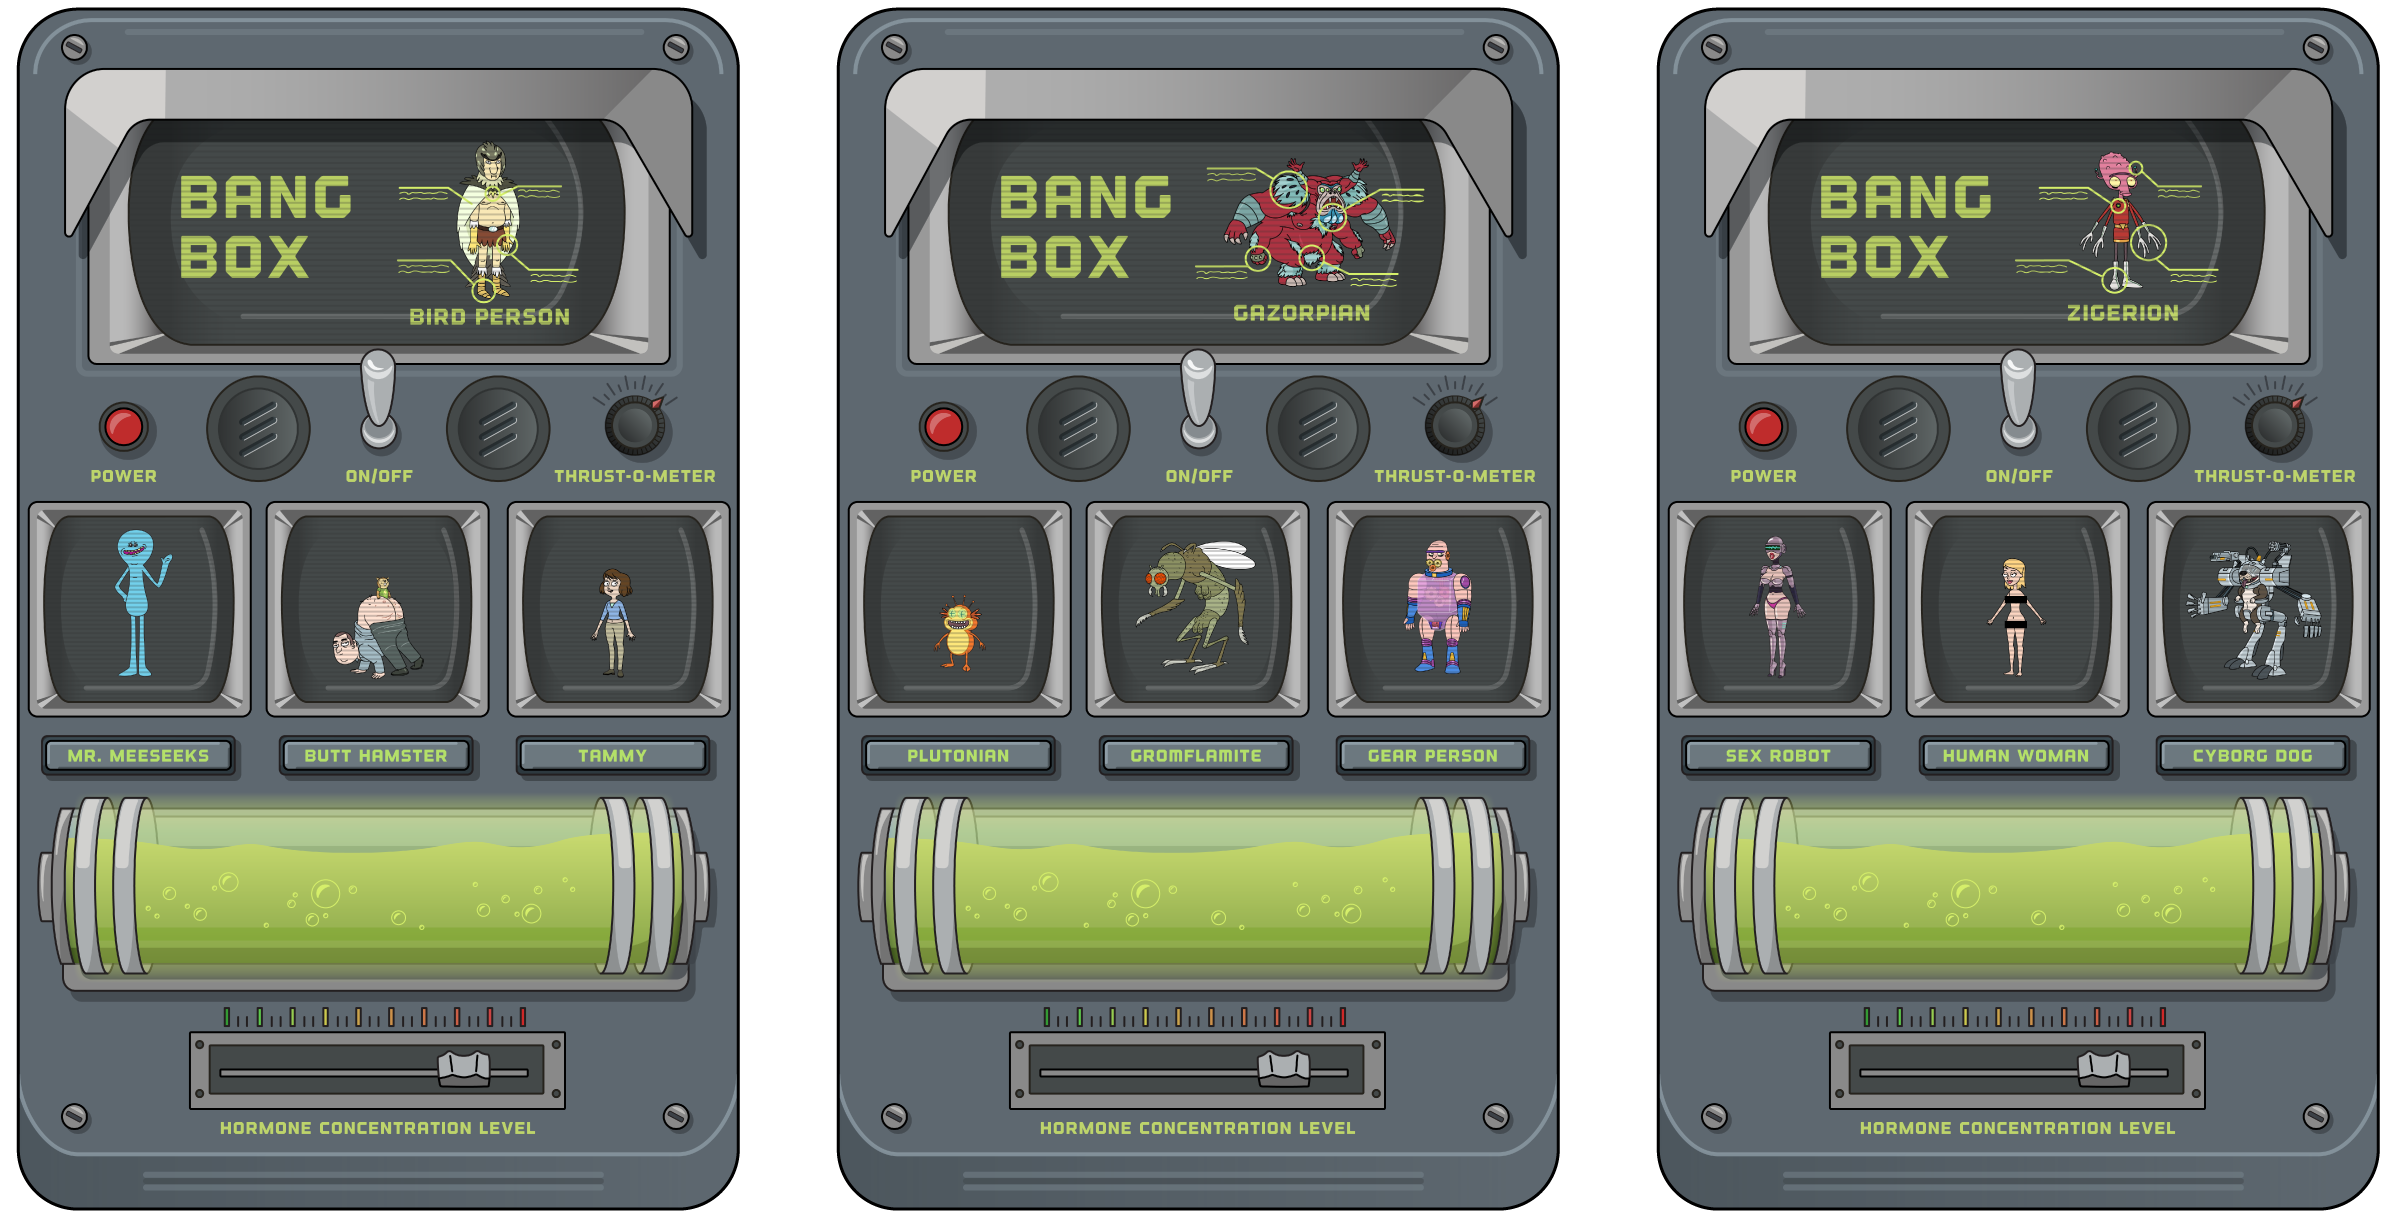 RAM_IG_Bangbox_WebGrid_v2.png